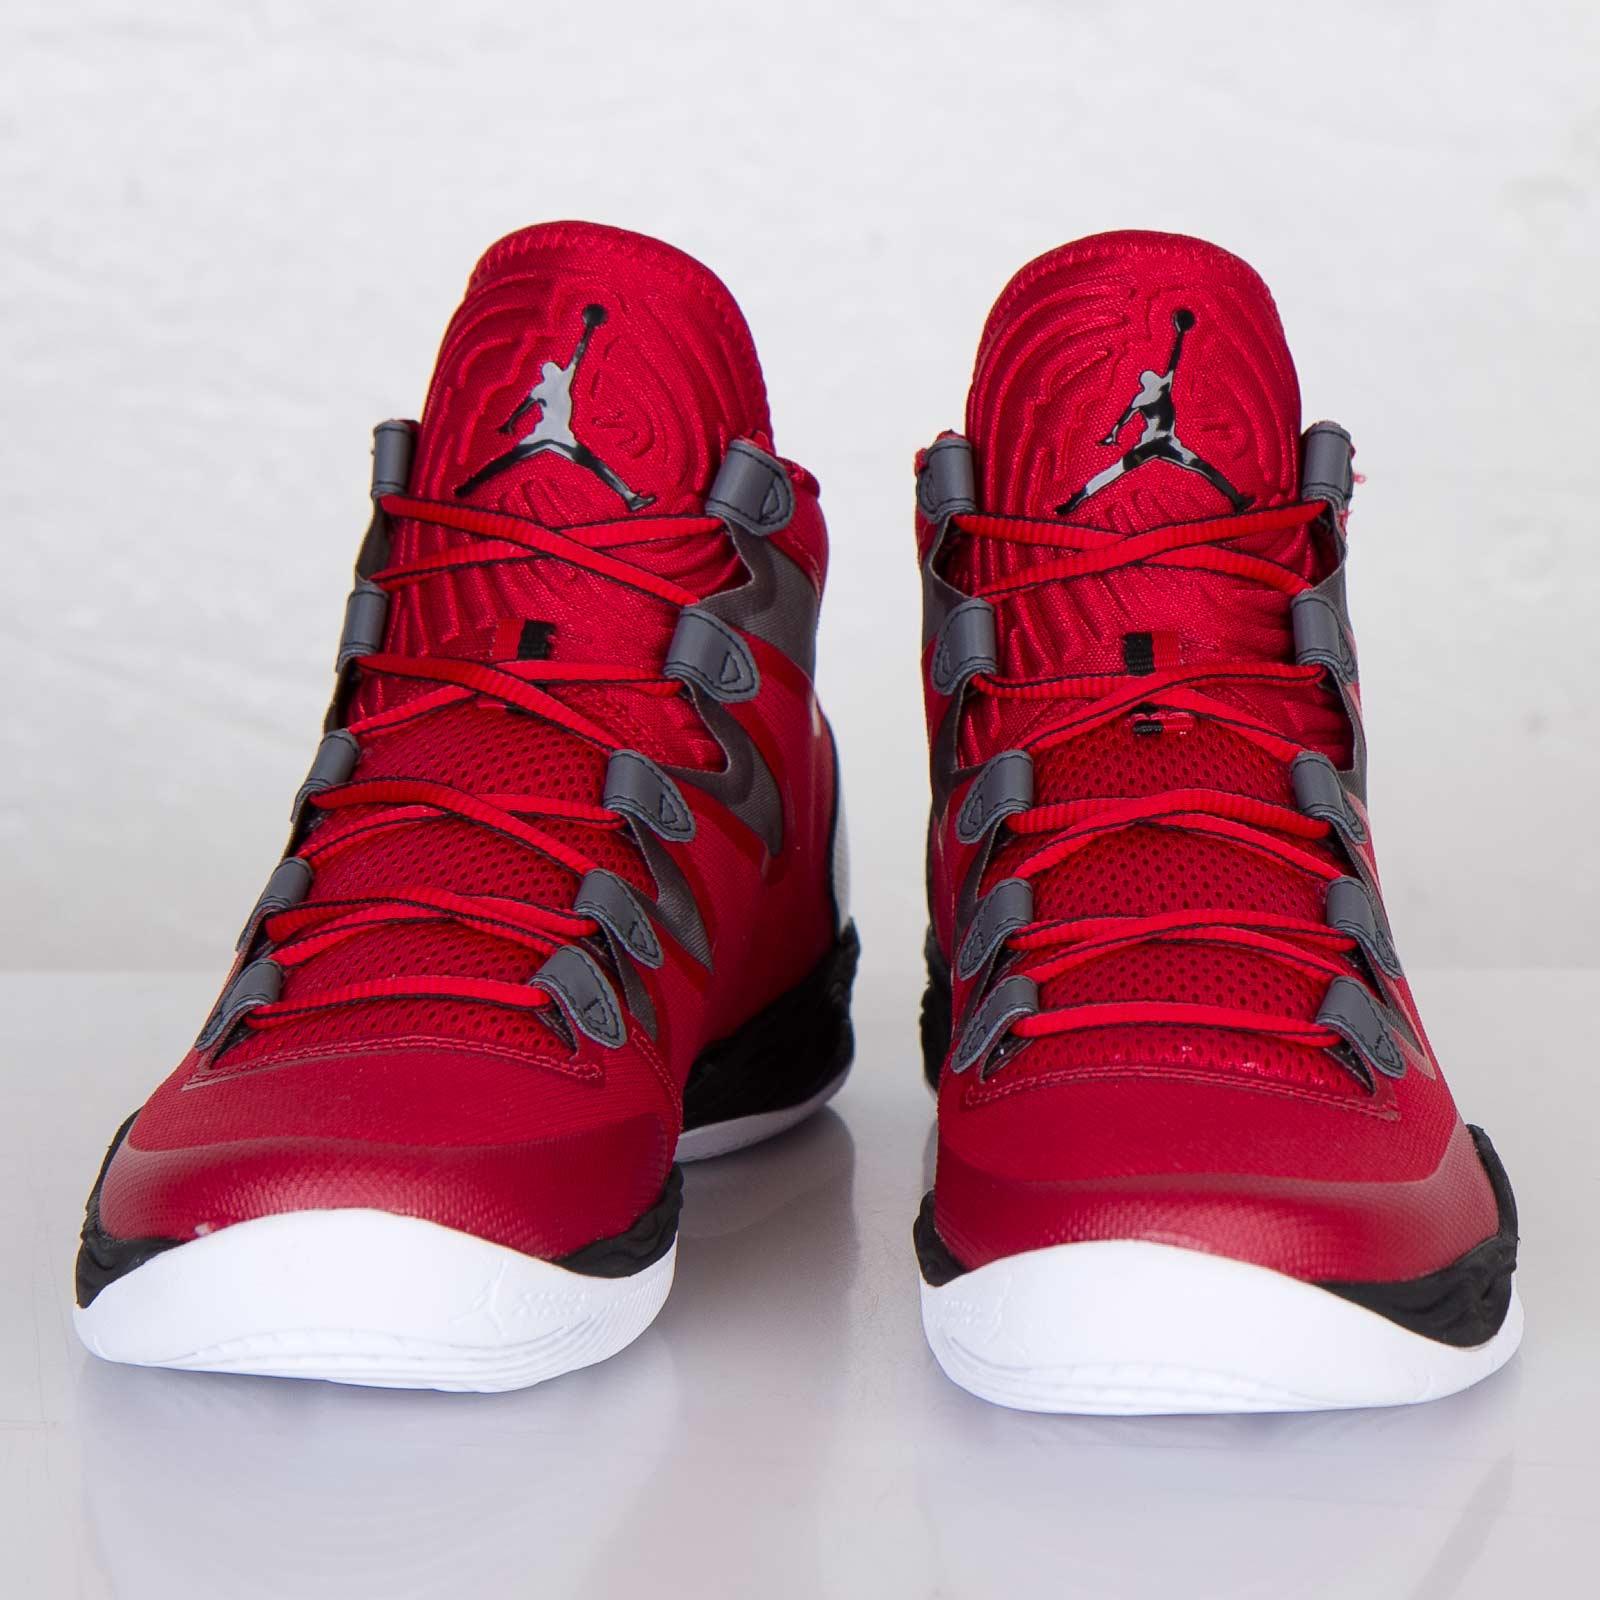 new style f647b 6689a Jordan Brand Air Jordan XX8 SE - 616345-601 - Sneakersnstuff ...